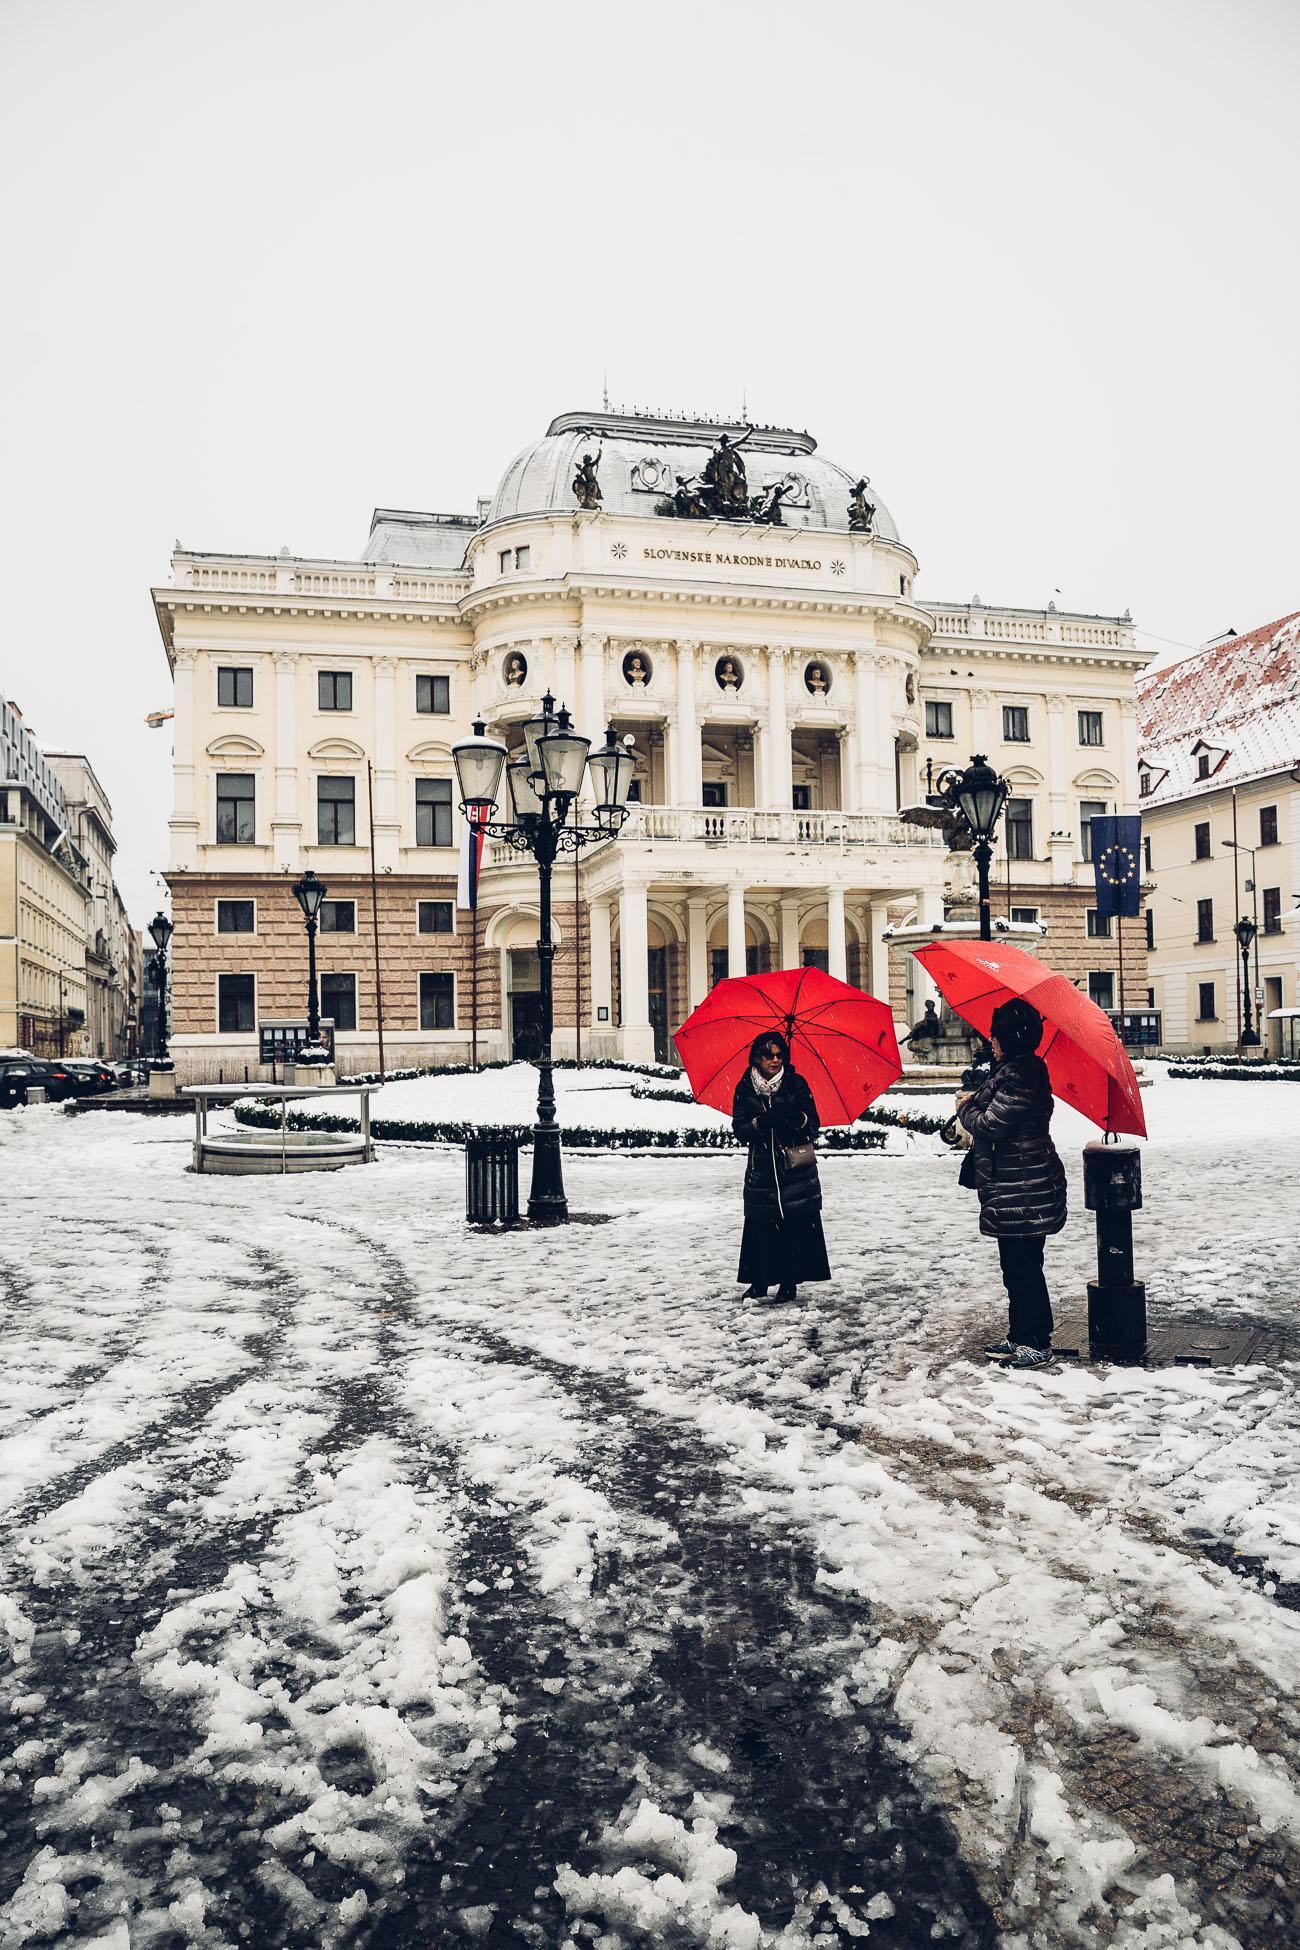 Historical building of the Slovak National Theatre at Hviezdoslavovo námestie, Bratislava